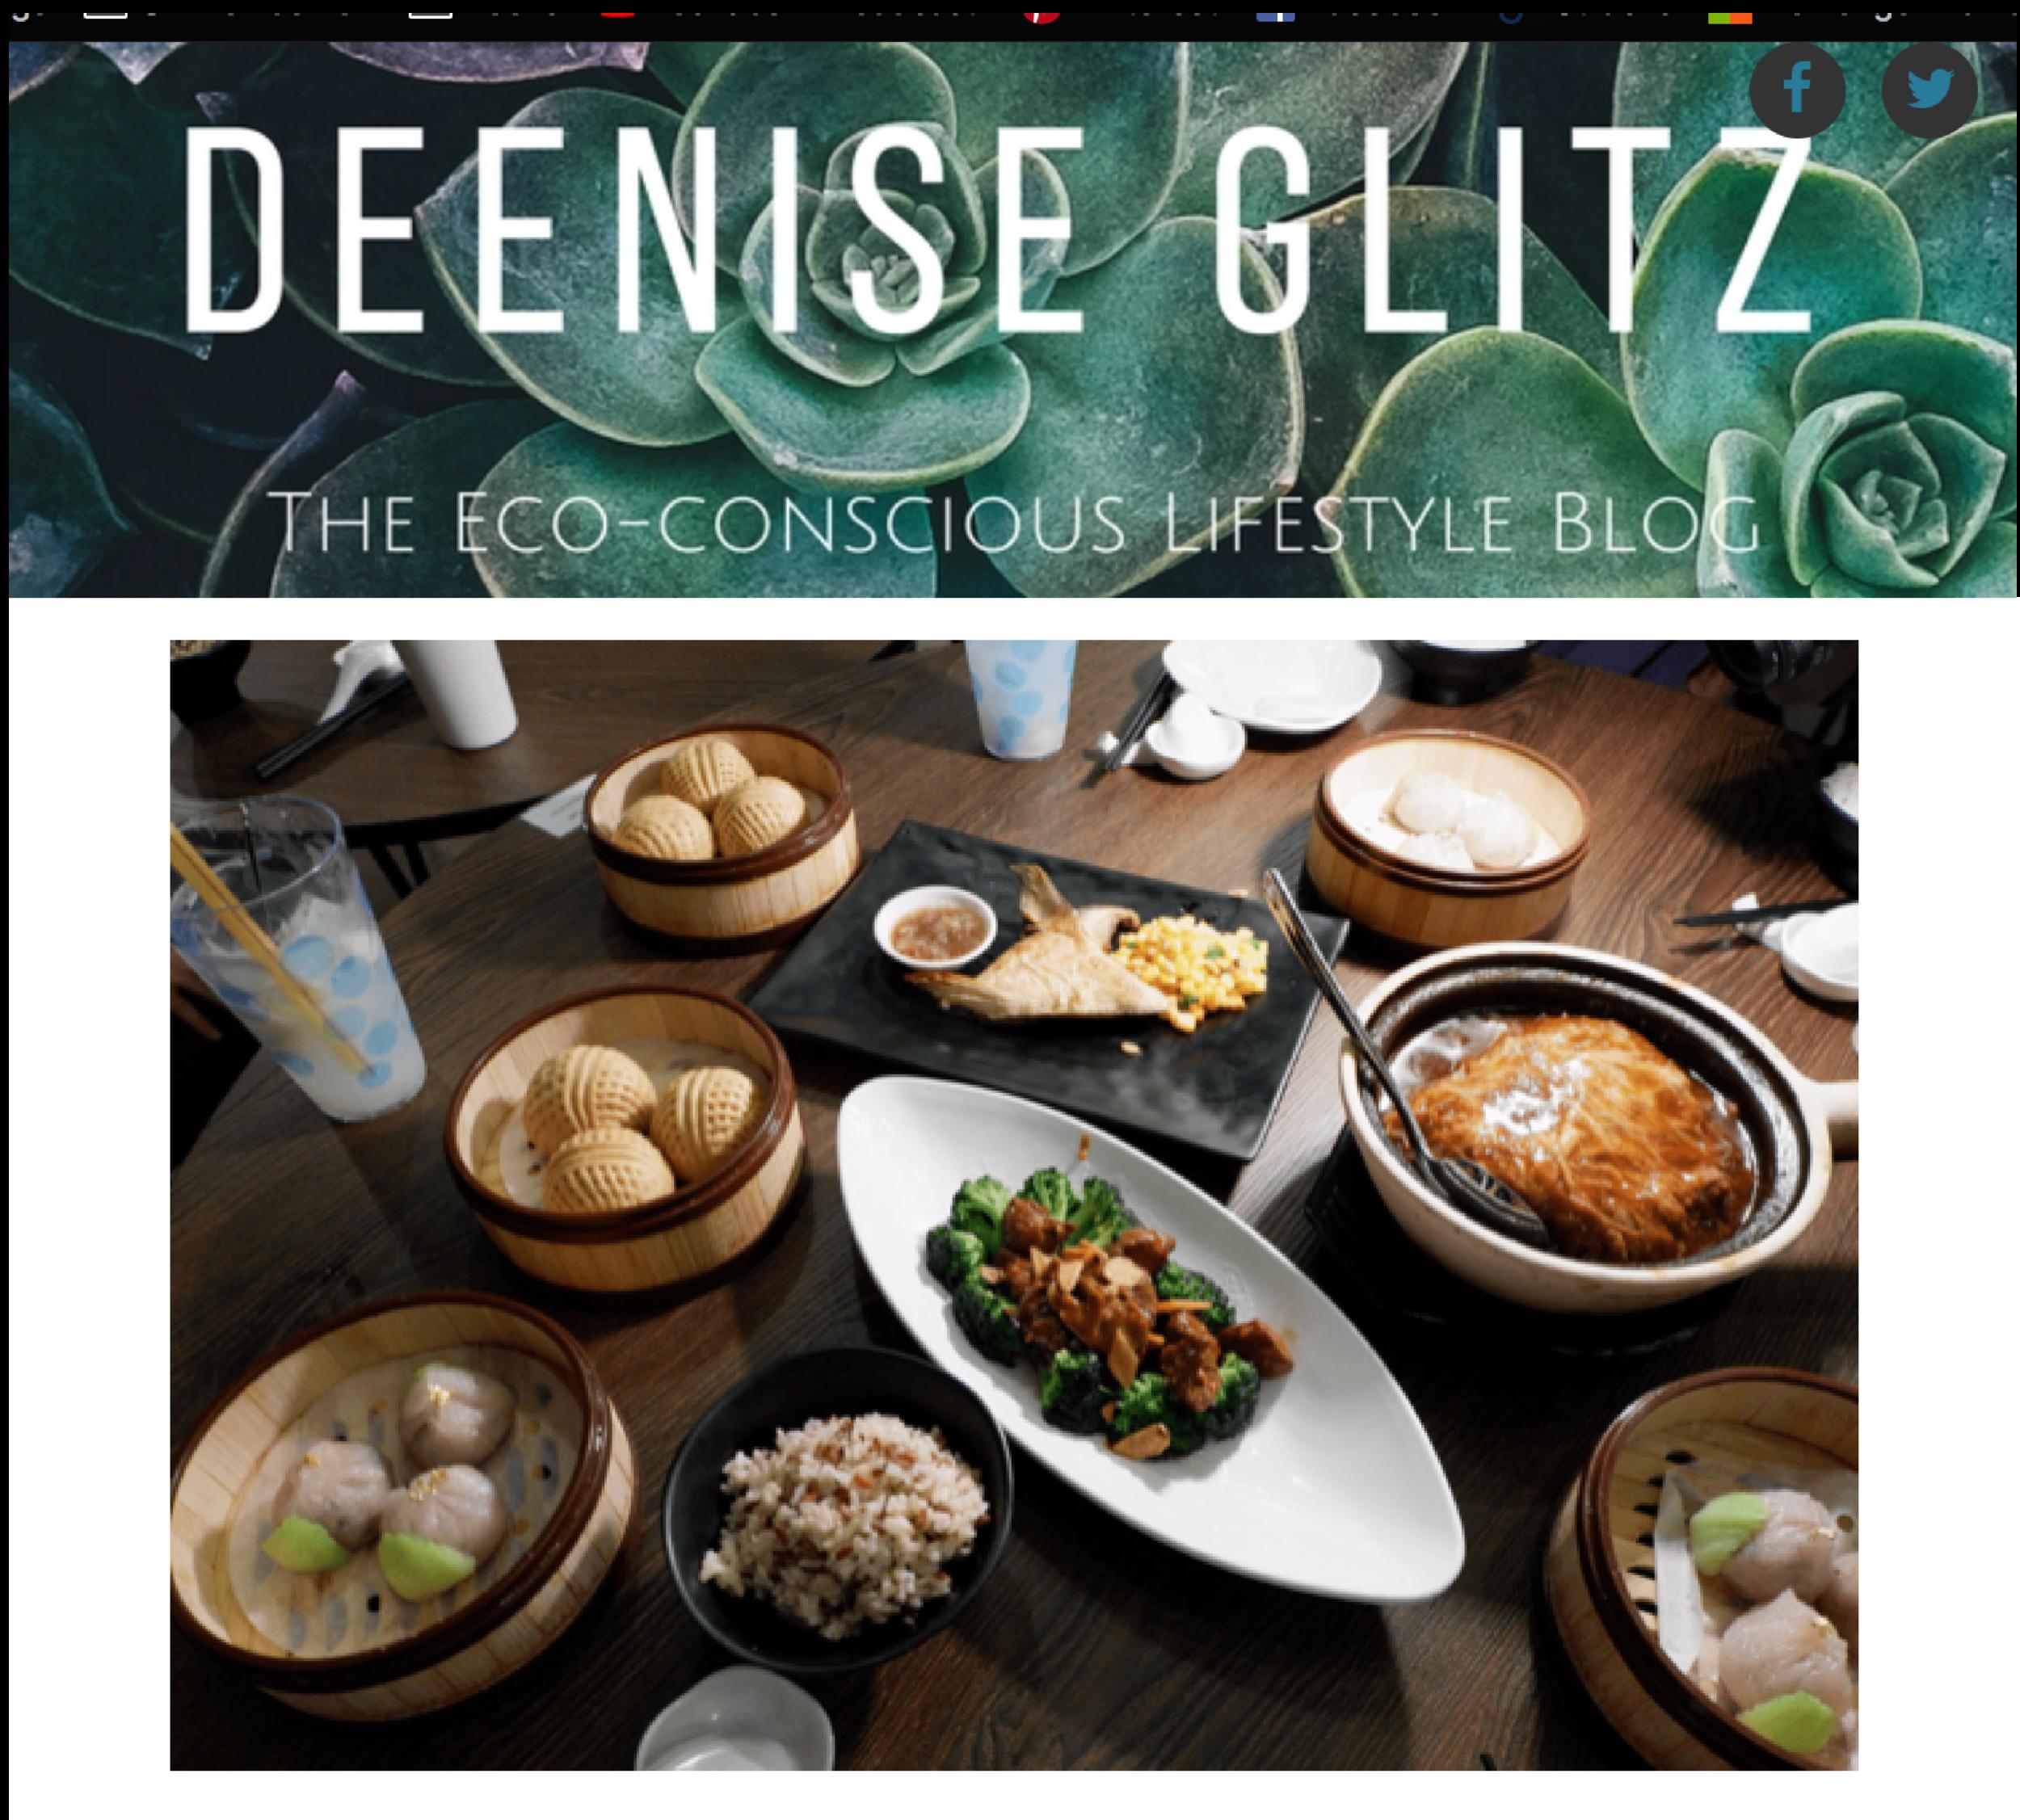 Deenise Glitz - PUBLISHED: JAN 13, 2018